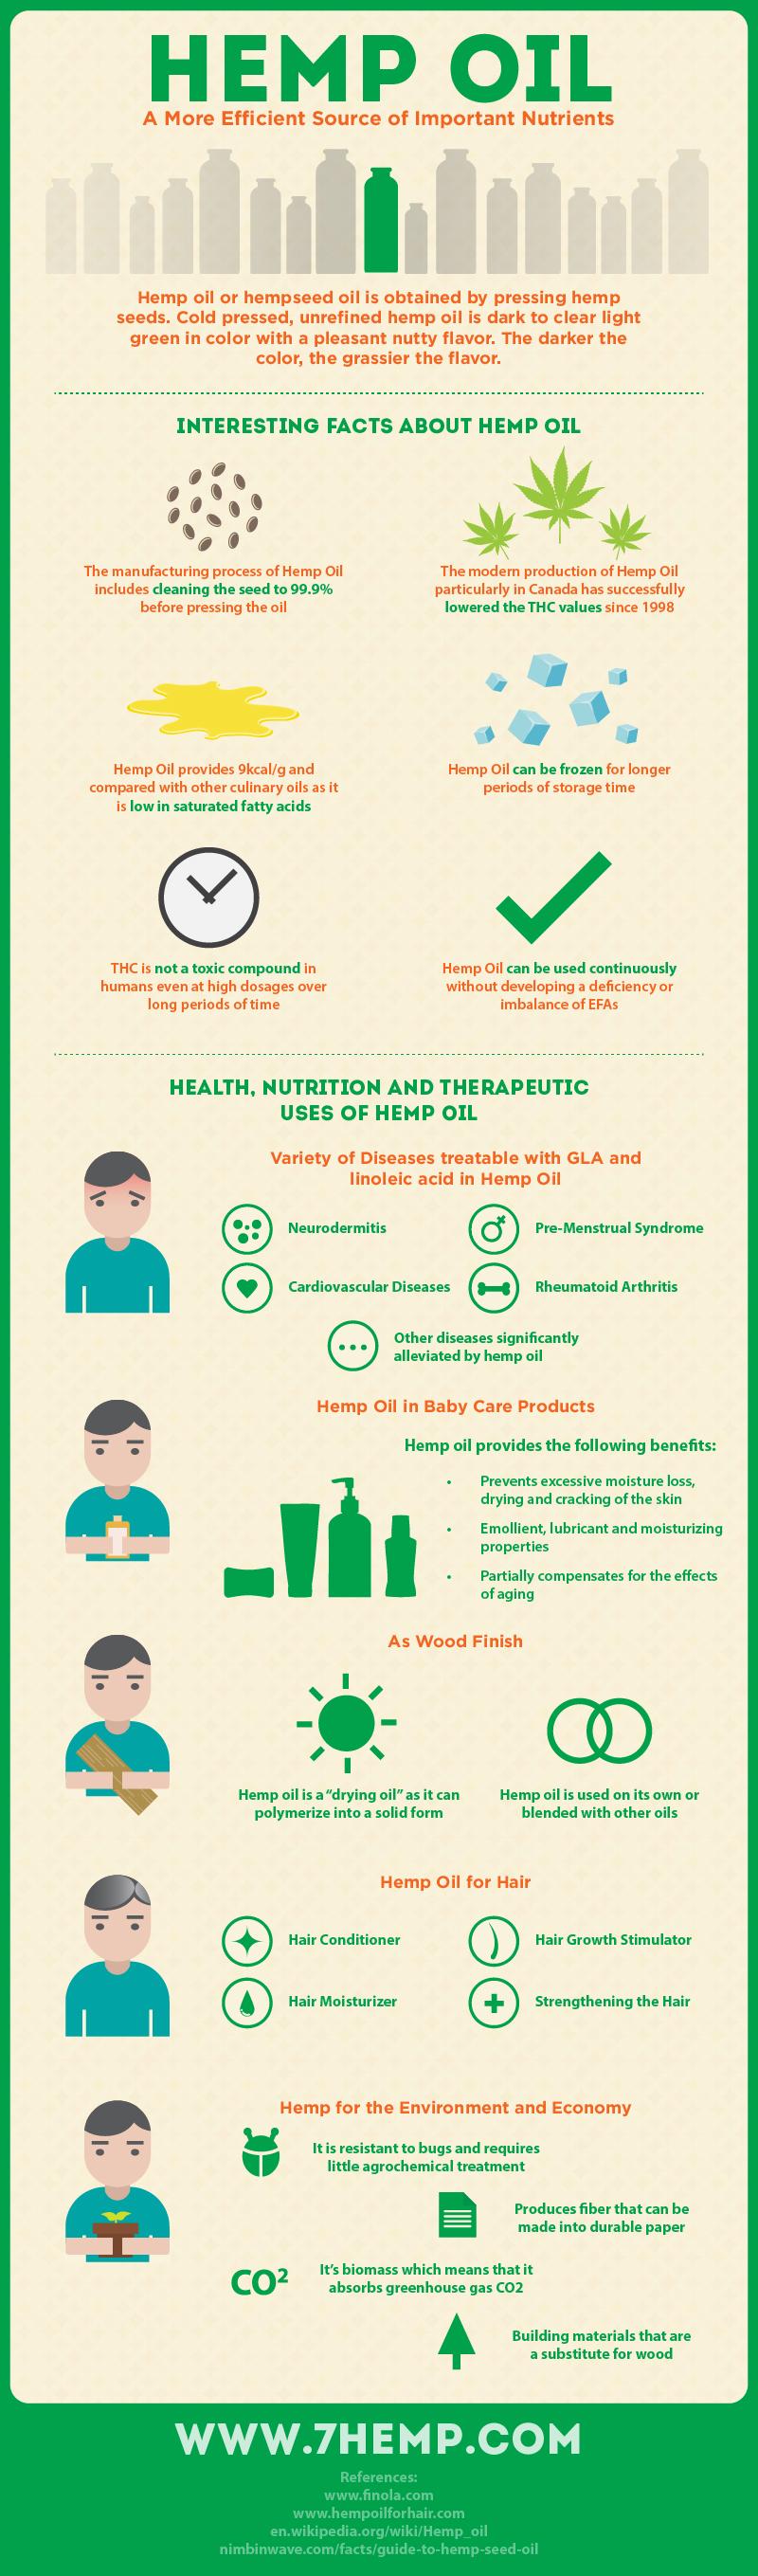 hemp-oil-benefits-infographic